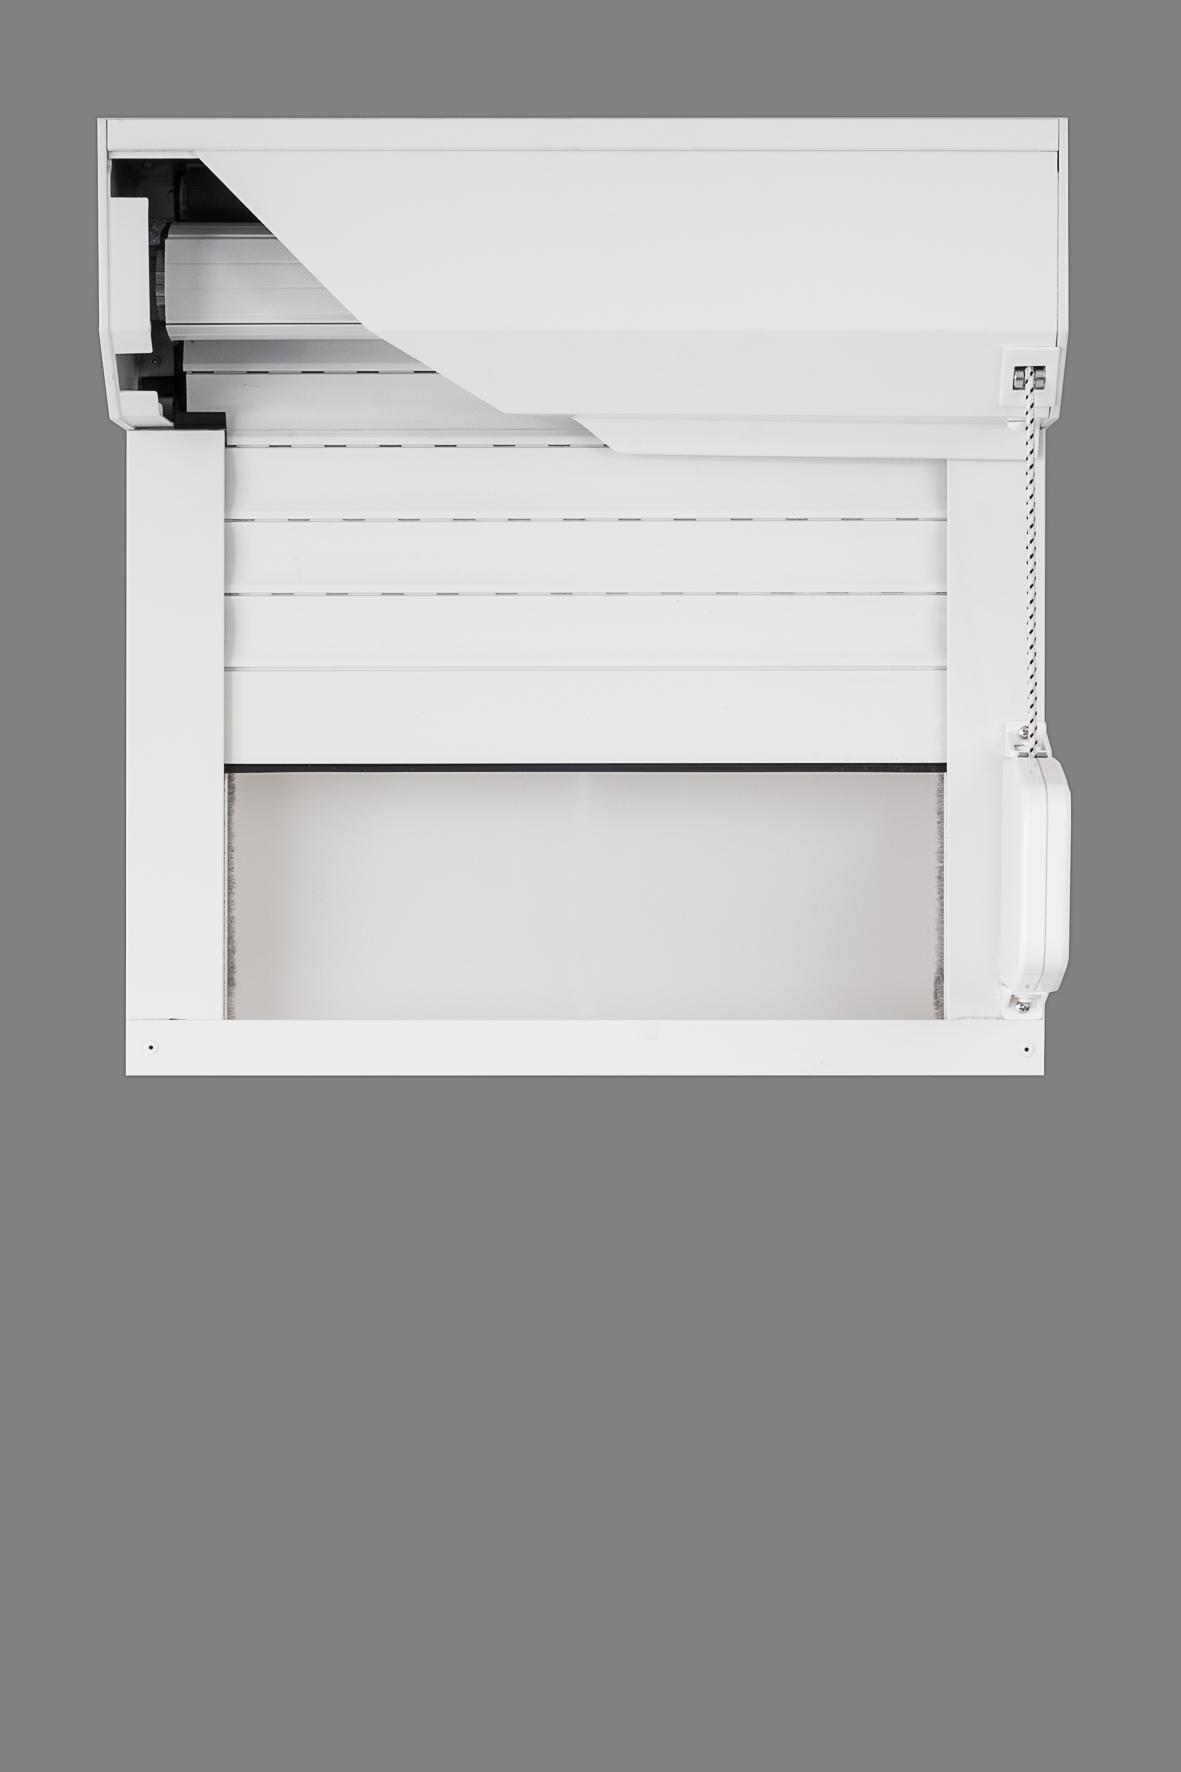 dsc0023-edit print10x15